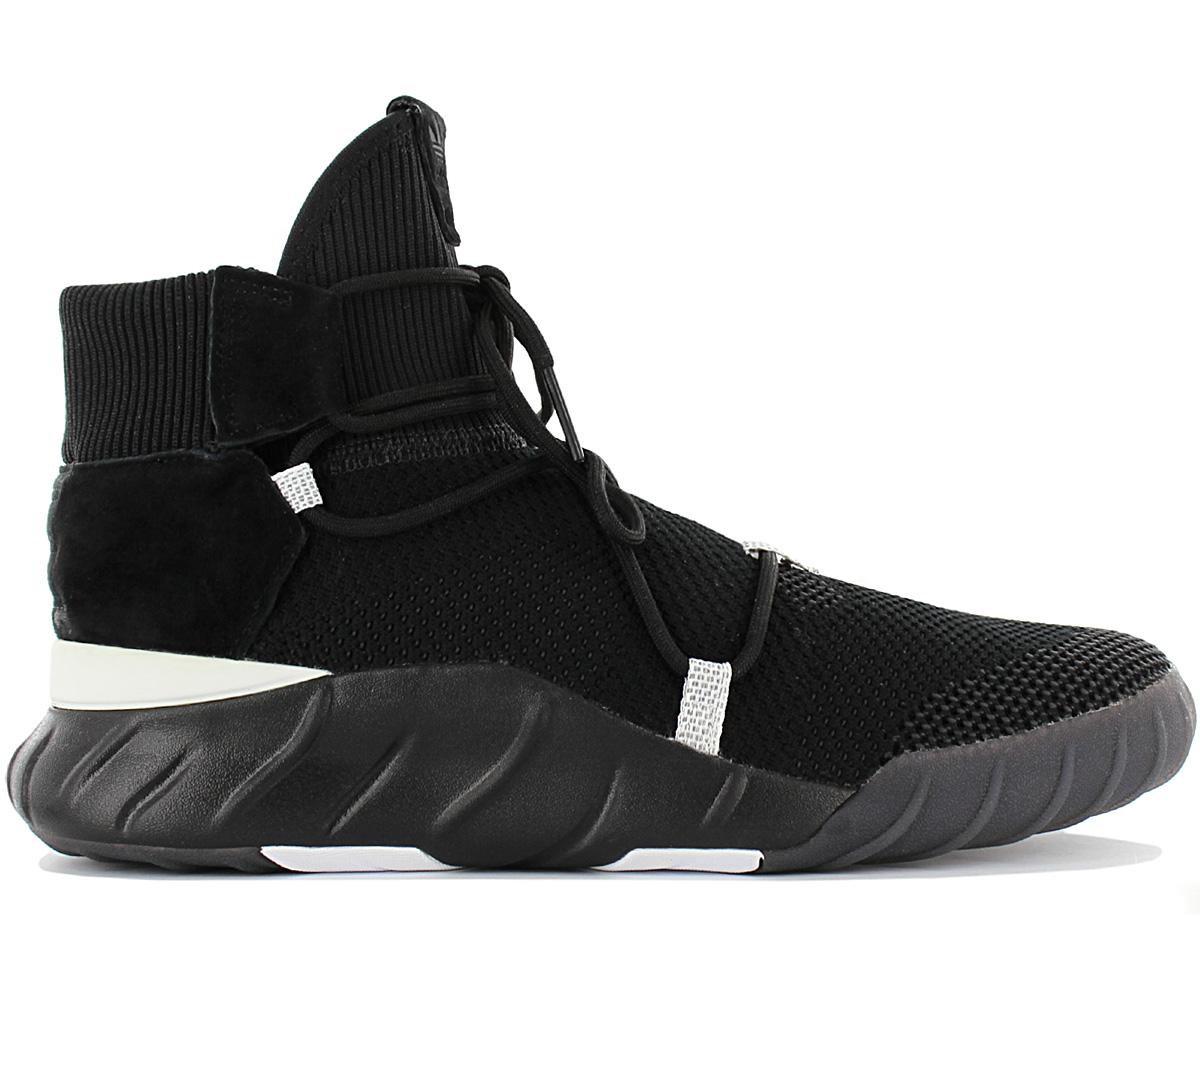 purchase cheap 4d52b fd42e Details about Adidas Originals Tubular x 2.0 Pk Primeknit Sneaker CQ1374  Black Shoes New